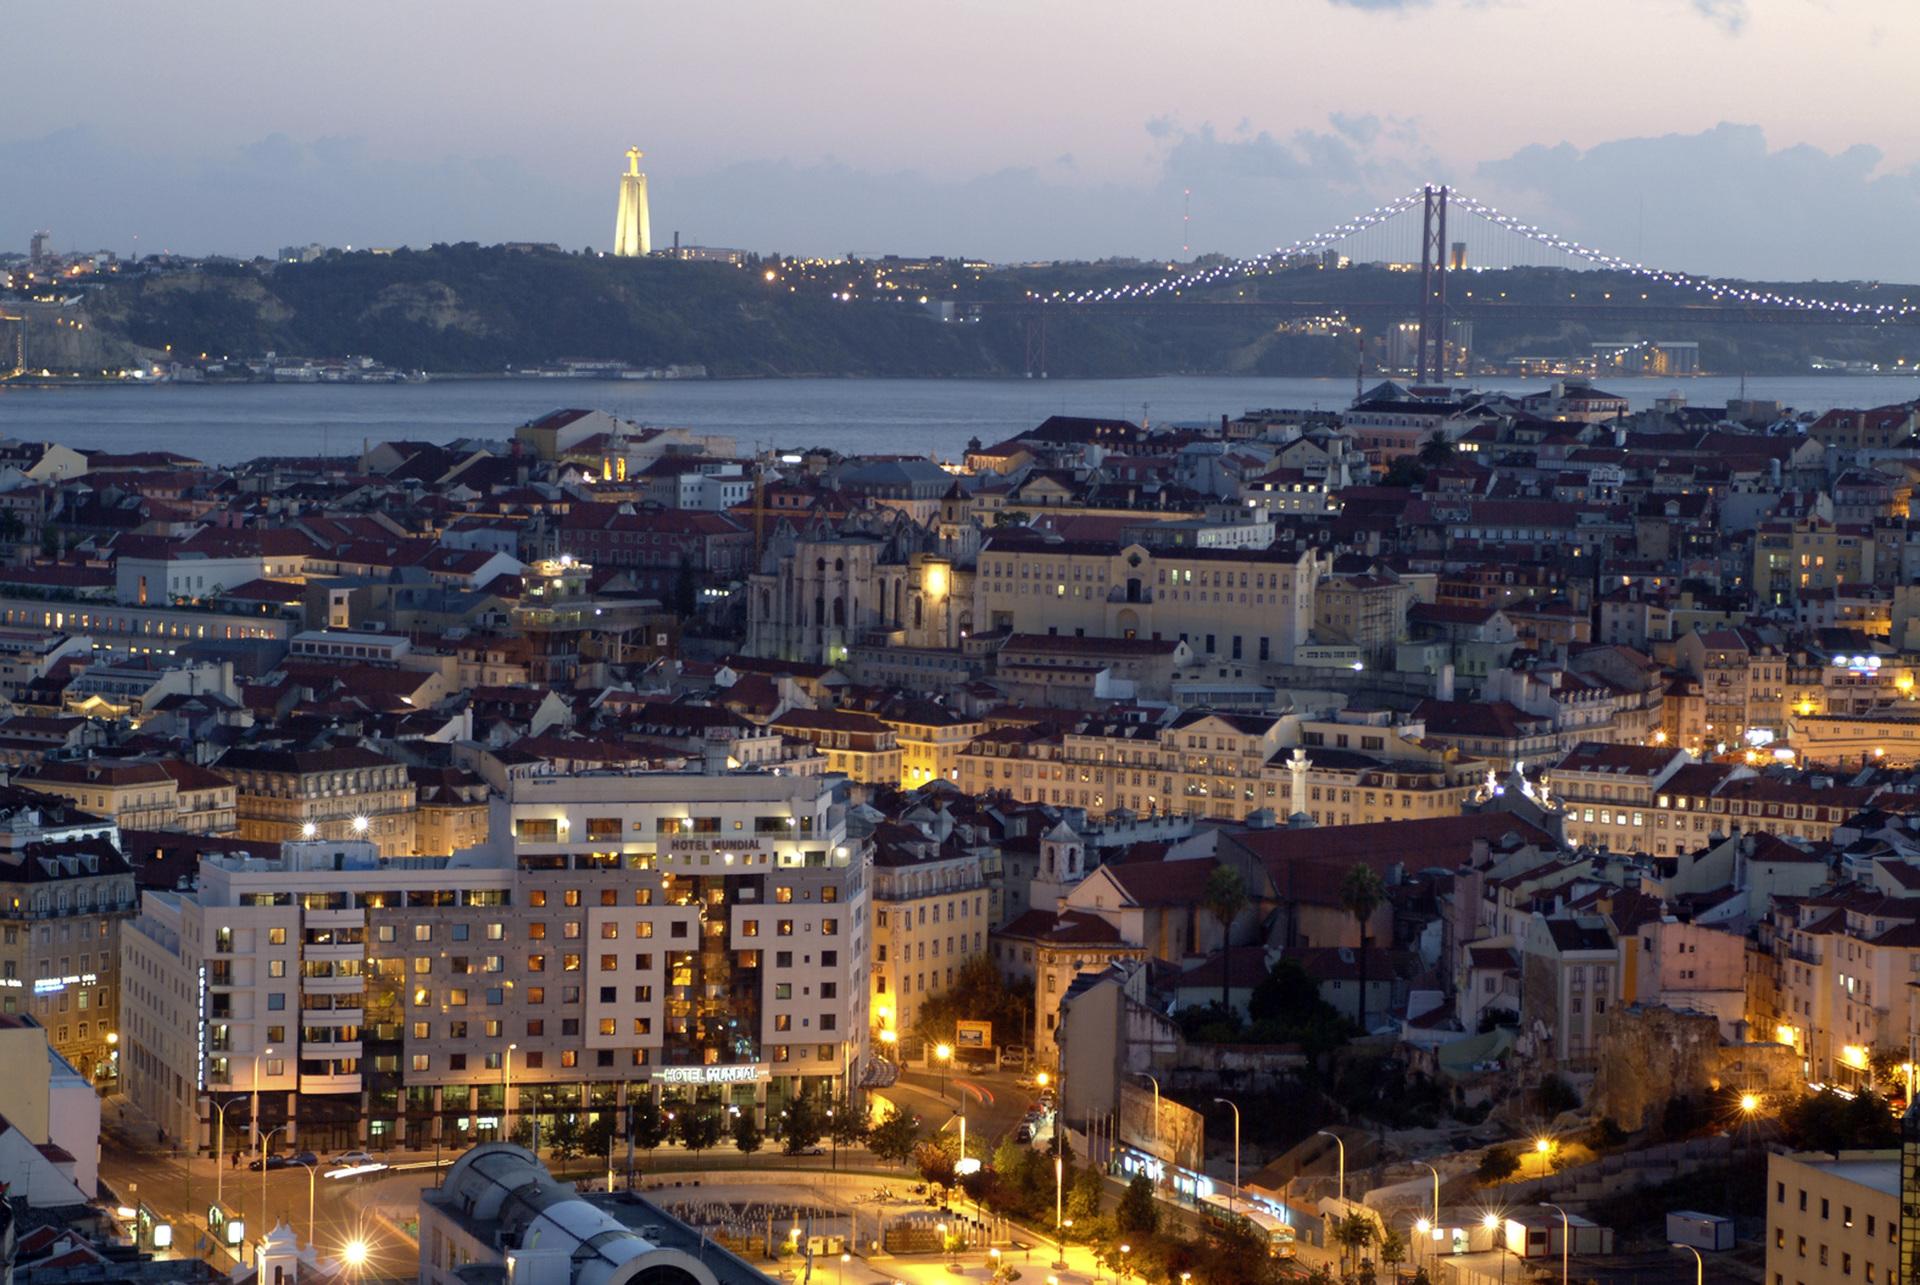 De centrale ligging van hotel Mundial in Lissabon